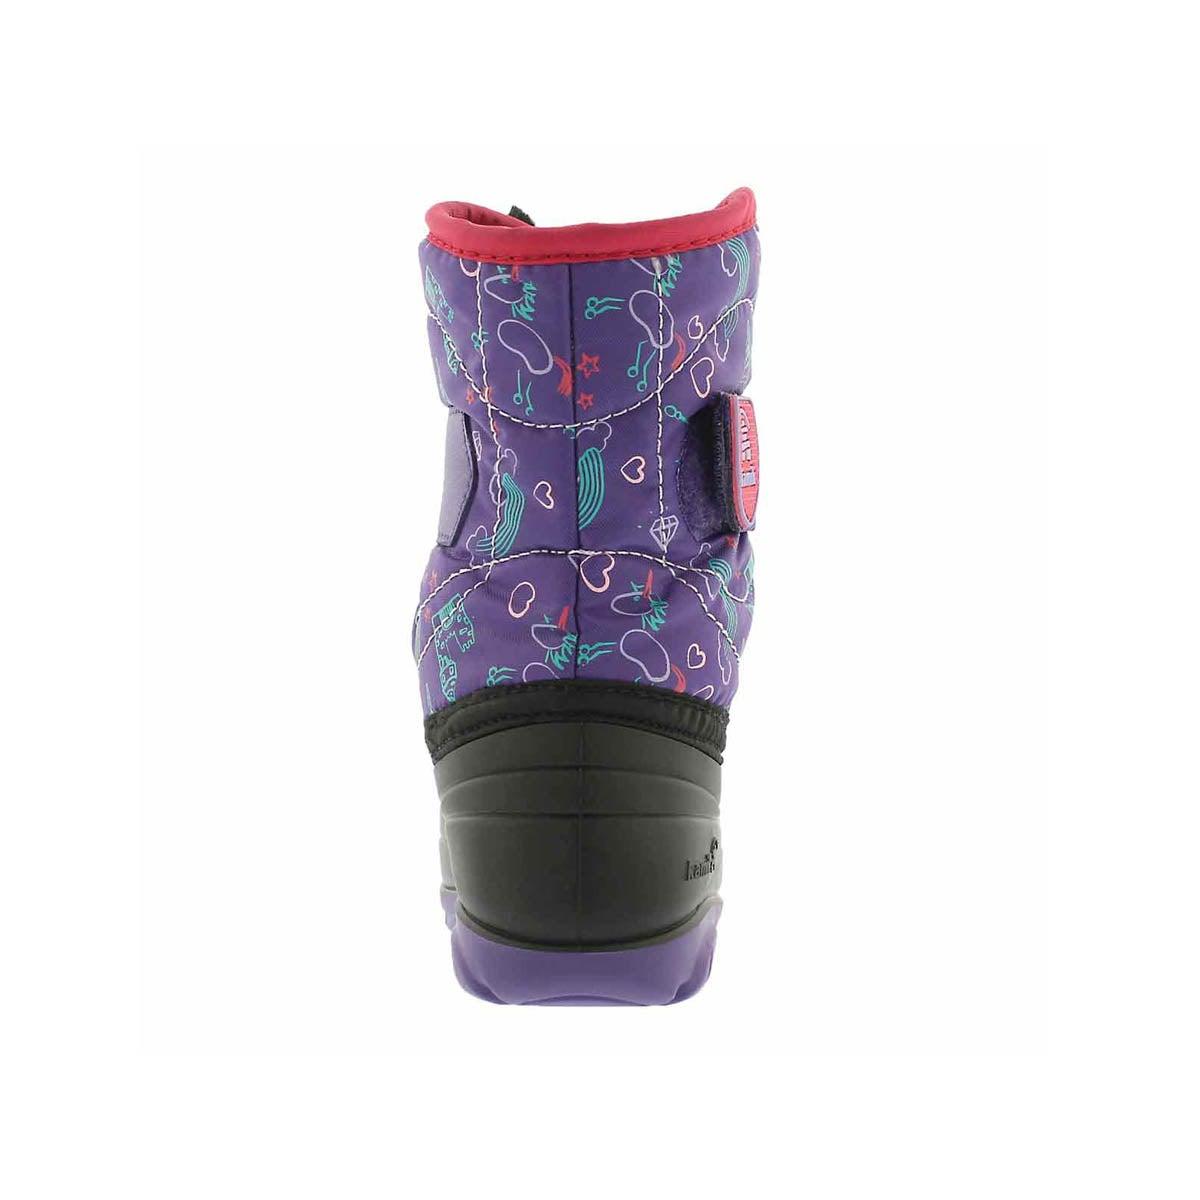 Inf-g Snowbug4 ppl wtpf winter boot